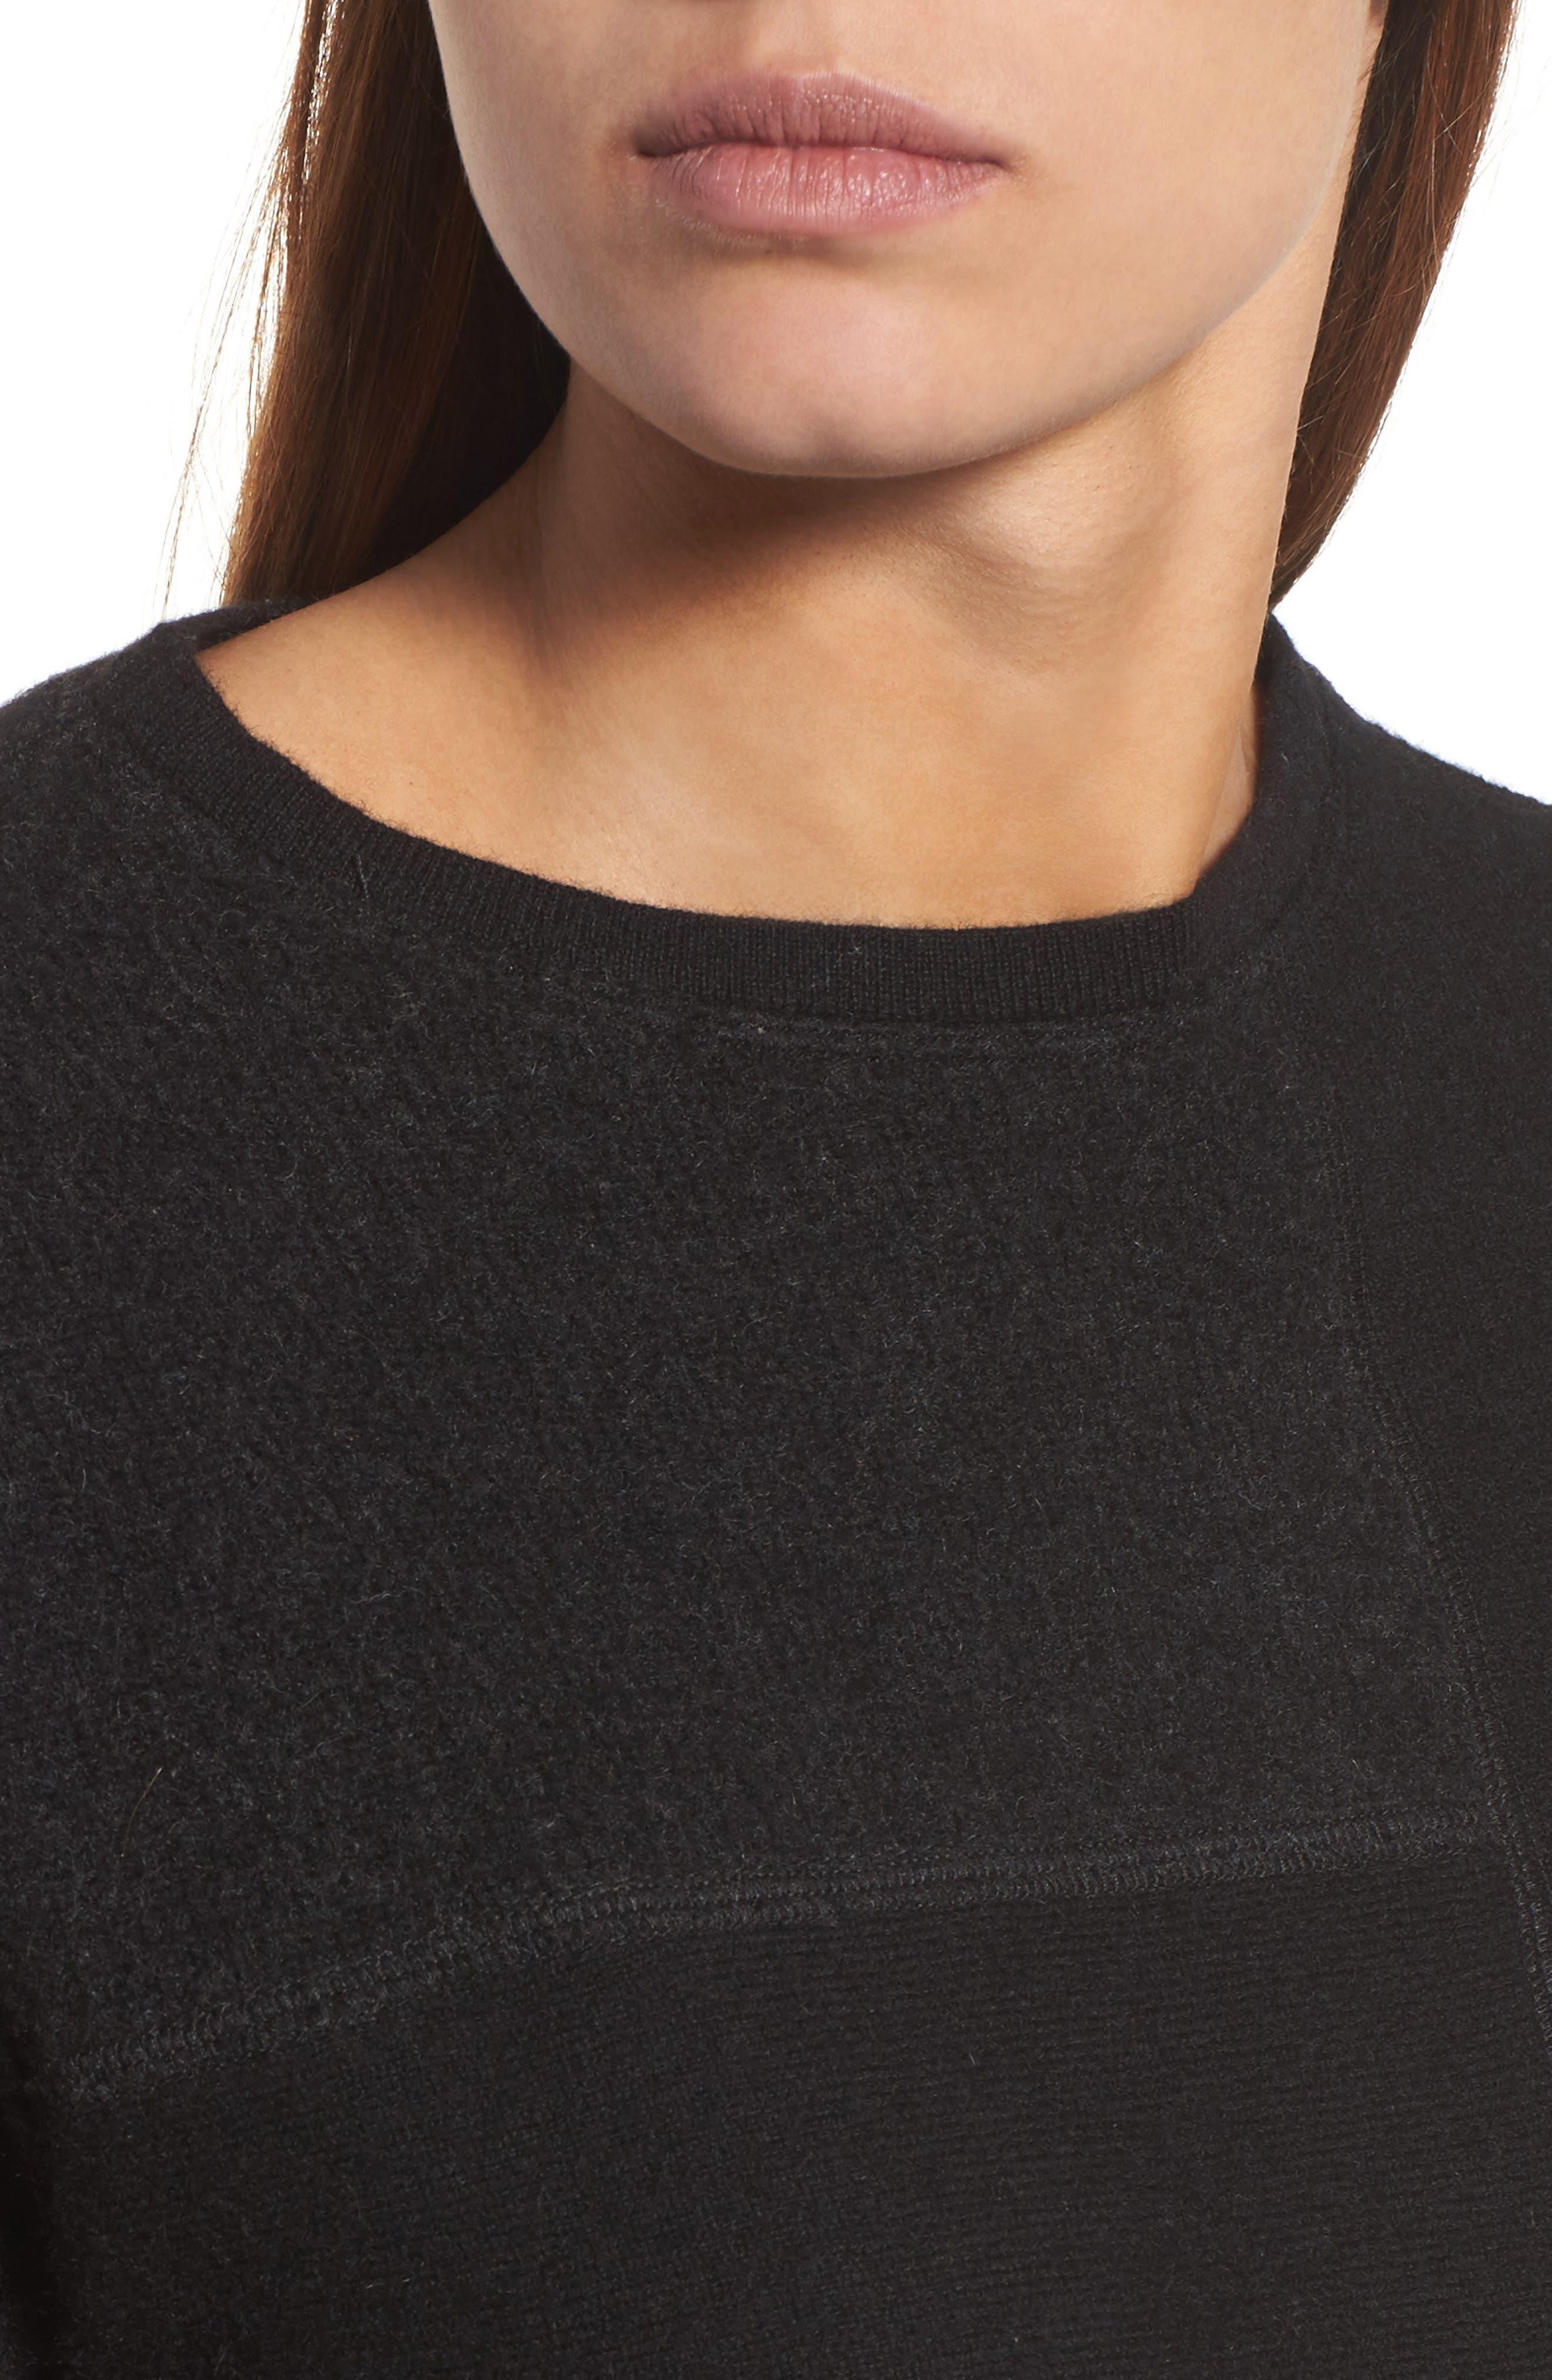 Colorblock Cashmere Sweater,                             Alternate thumbnail 4, color,                             001